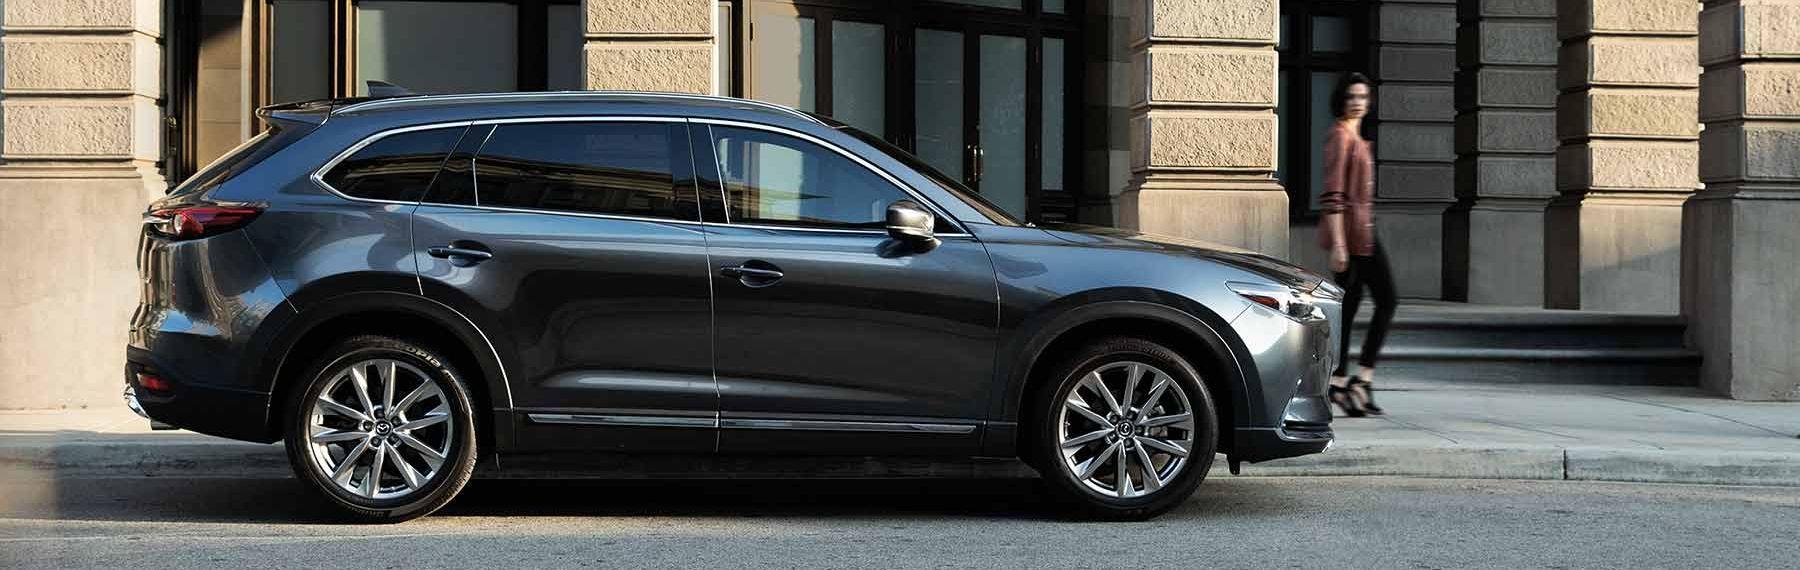 2019 Mazda CX-9 Financing near Detroit, MI